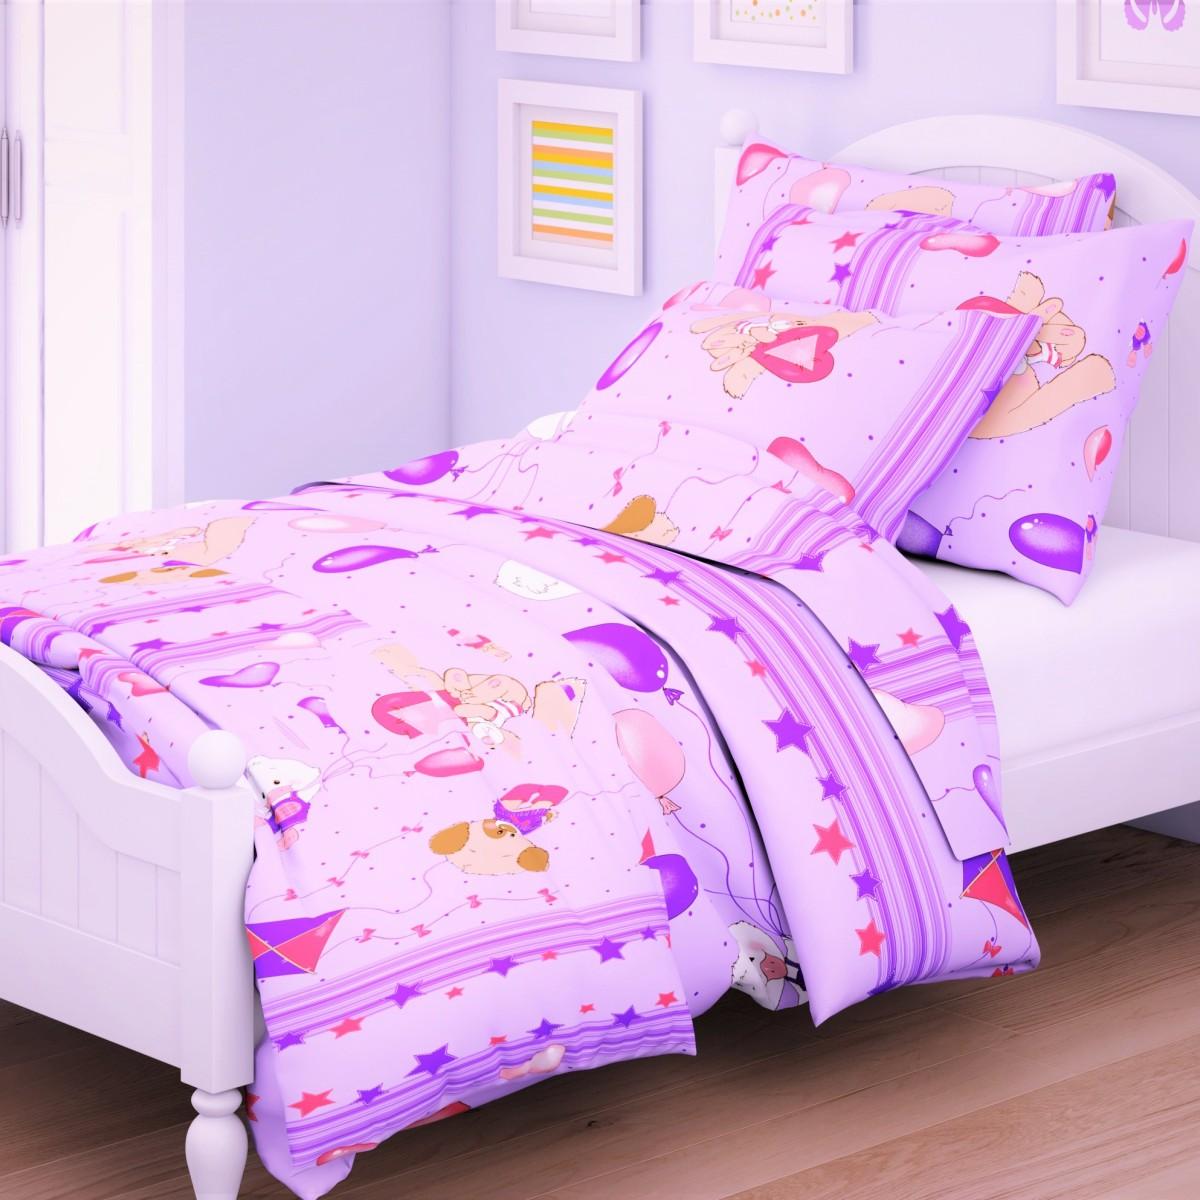 Letto Комплект в кроватку Ясли с простыней на резинке 3 предмета BGR-62, Letto Home Textile